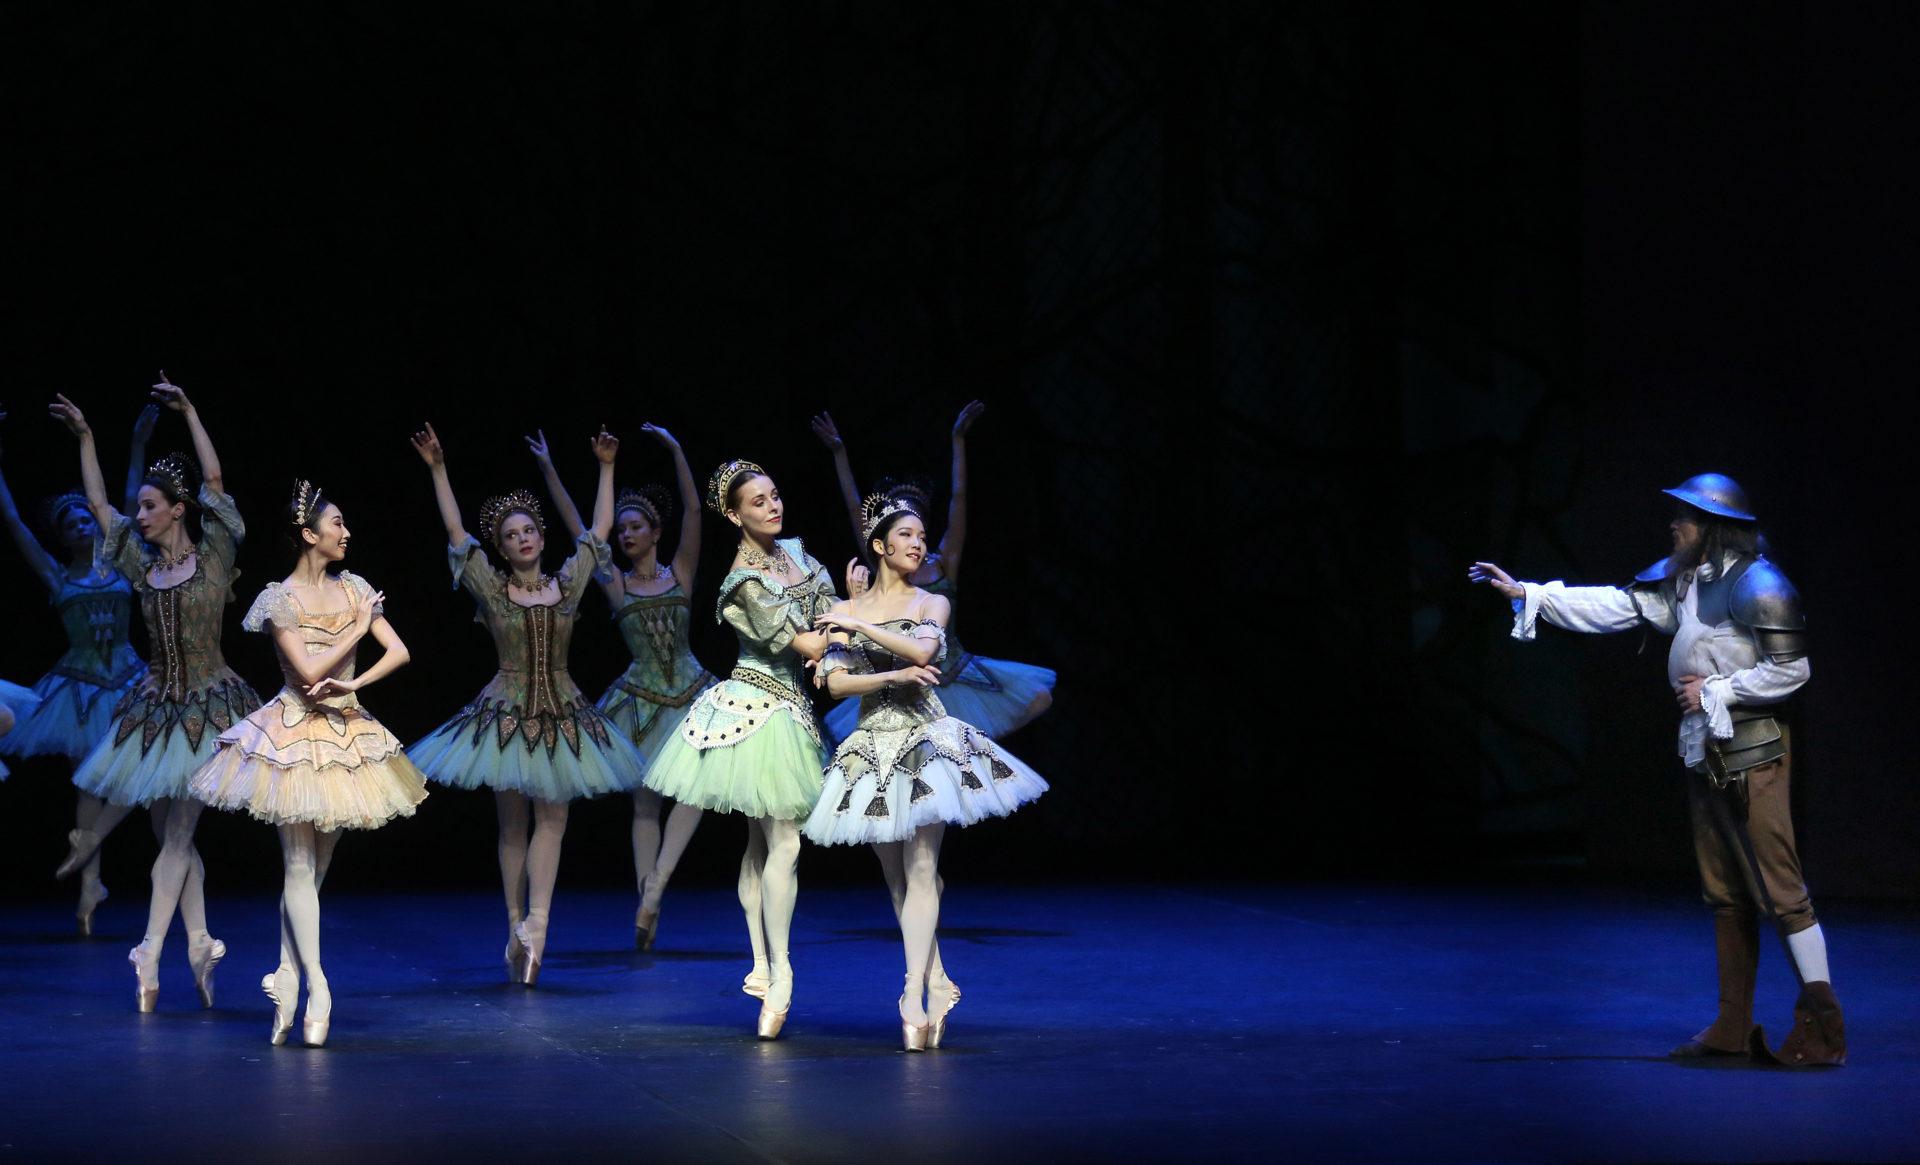 Don_Quixote_HH_Ballett_Foto_AnjaBeutler.de_533